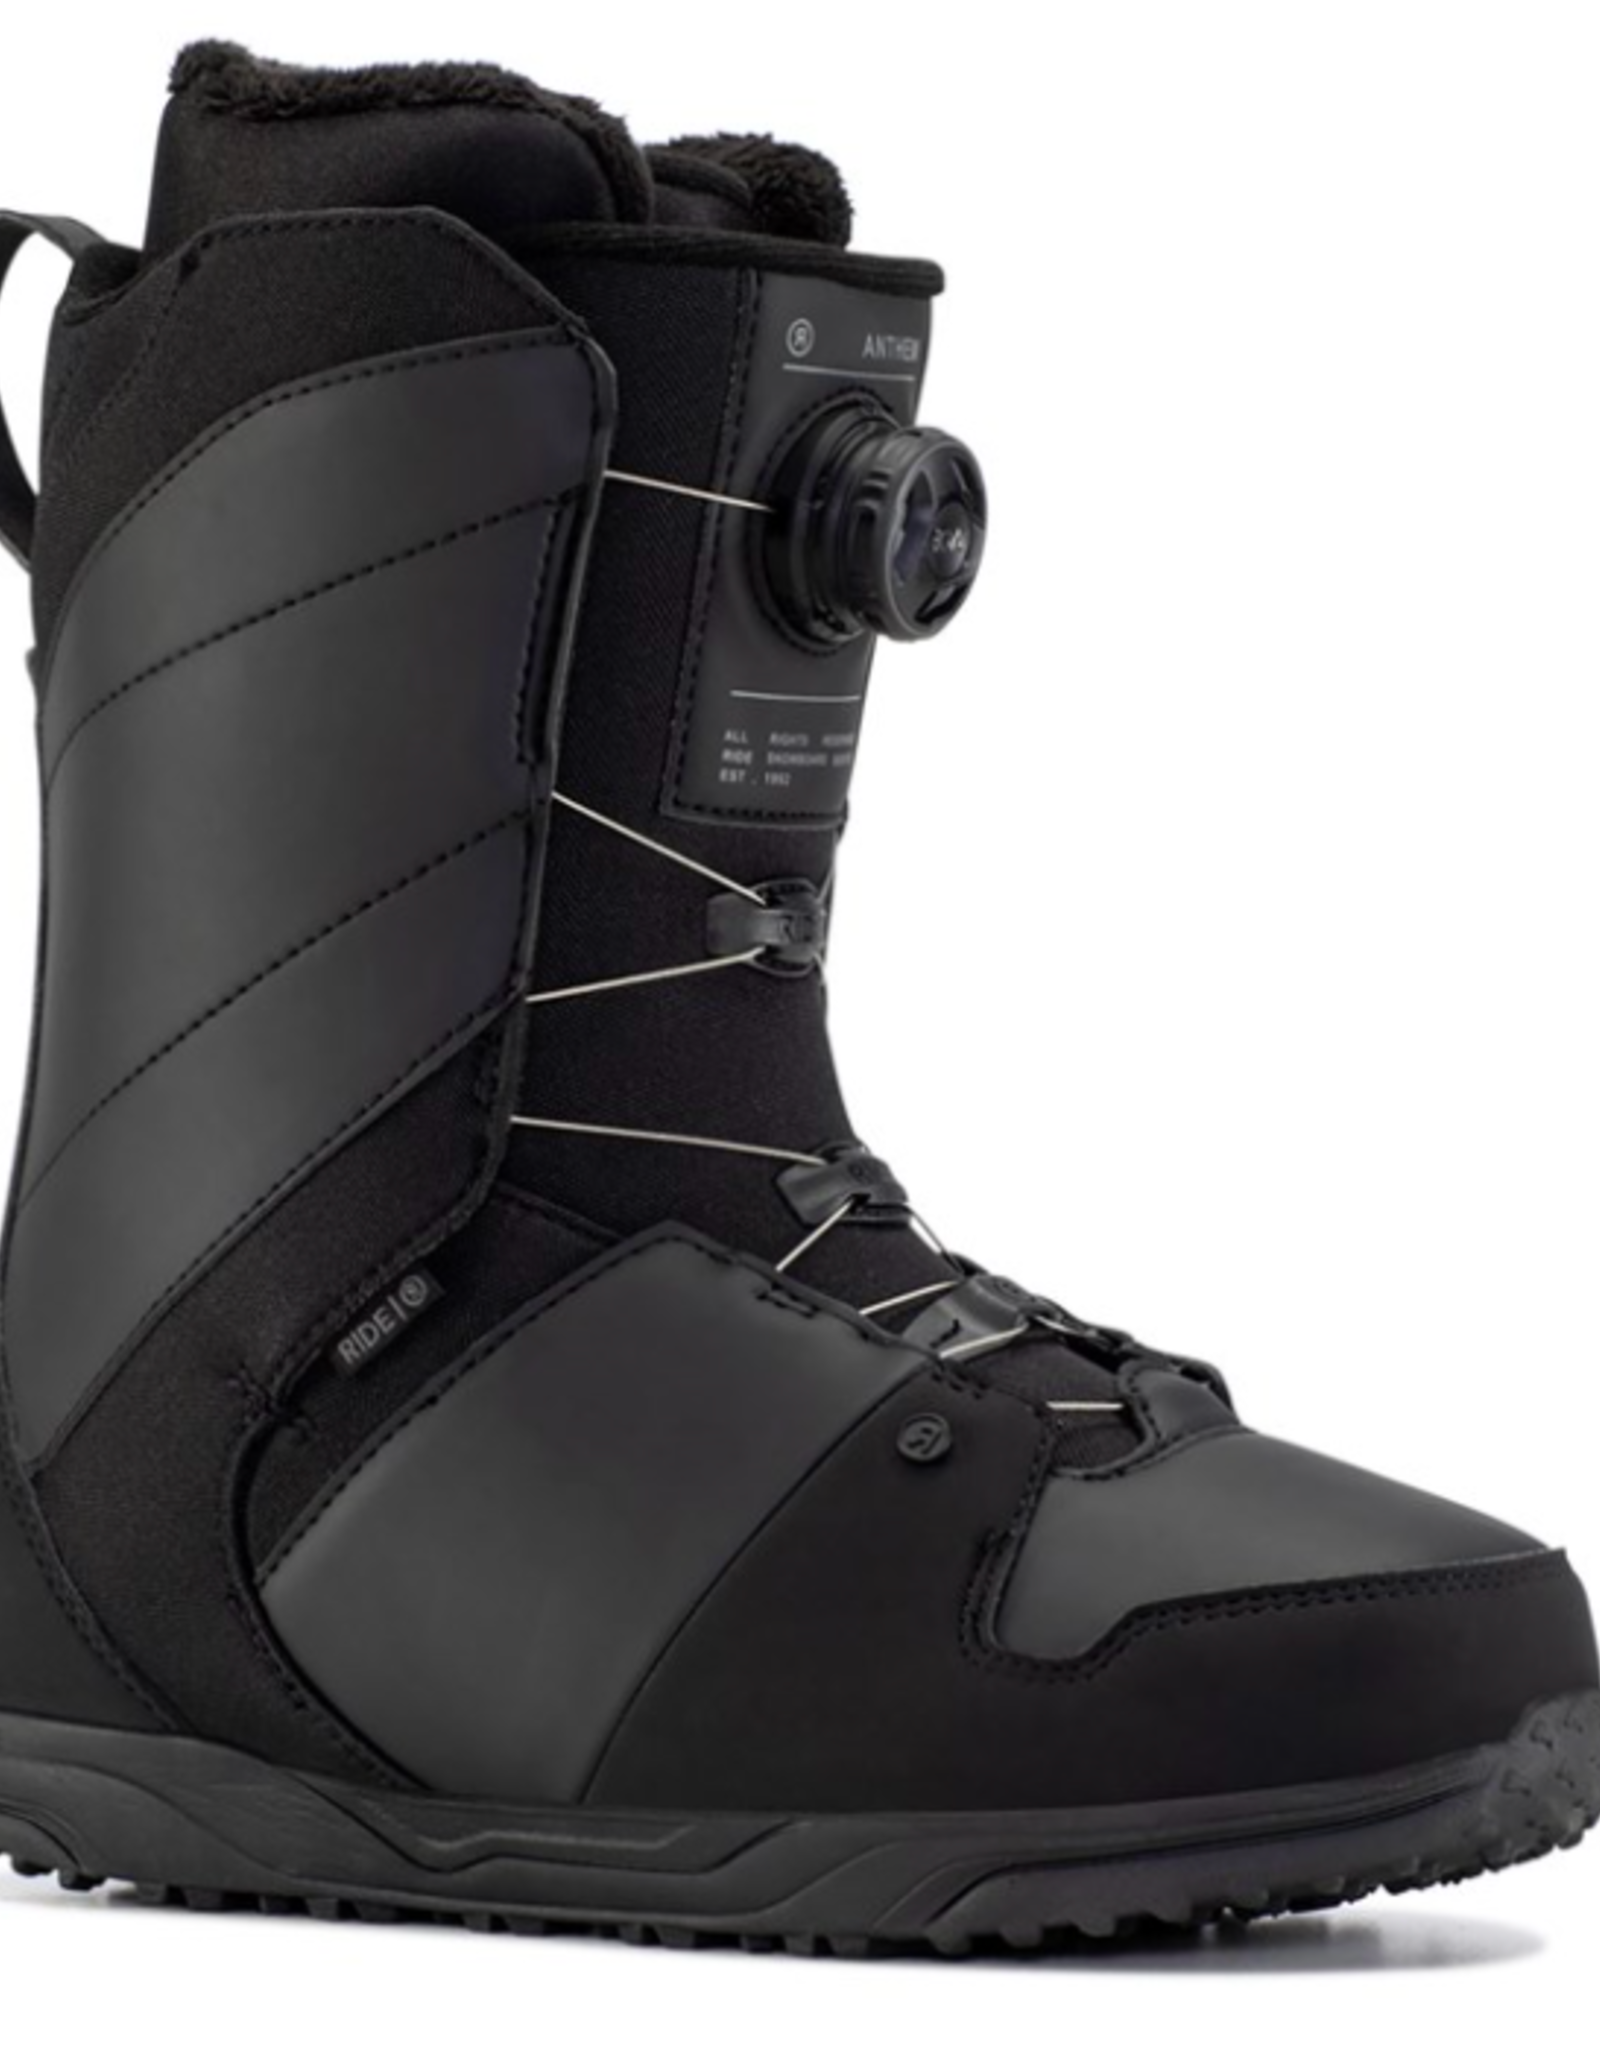 RIDE Ride Men's Anthem Snowboard Boots Black 2022